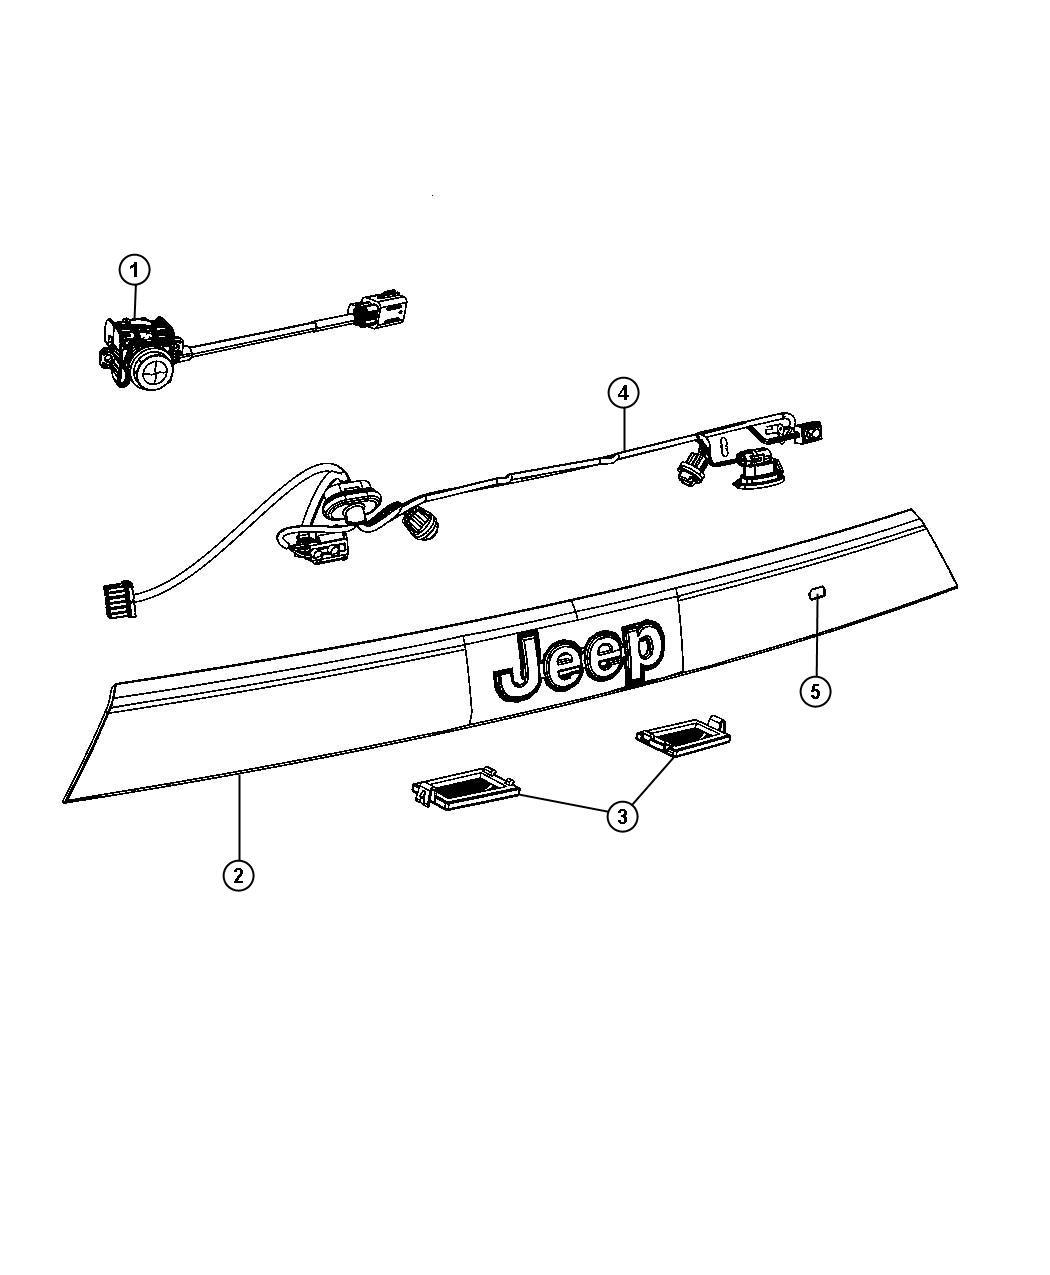 Jeep Grand Cherokee Camera Xac Rear Back